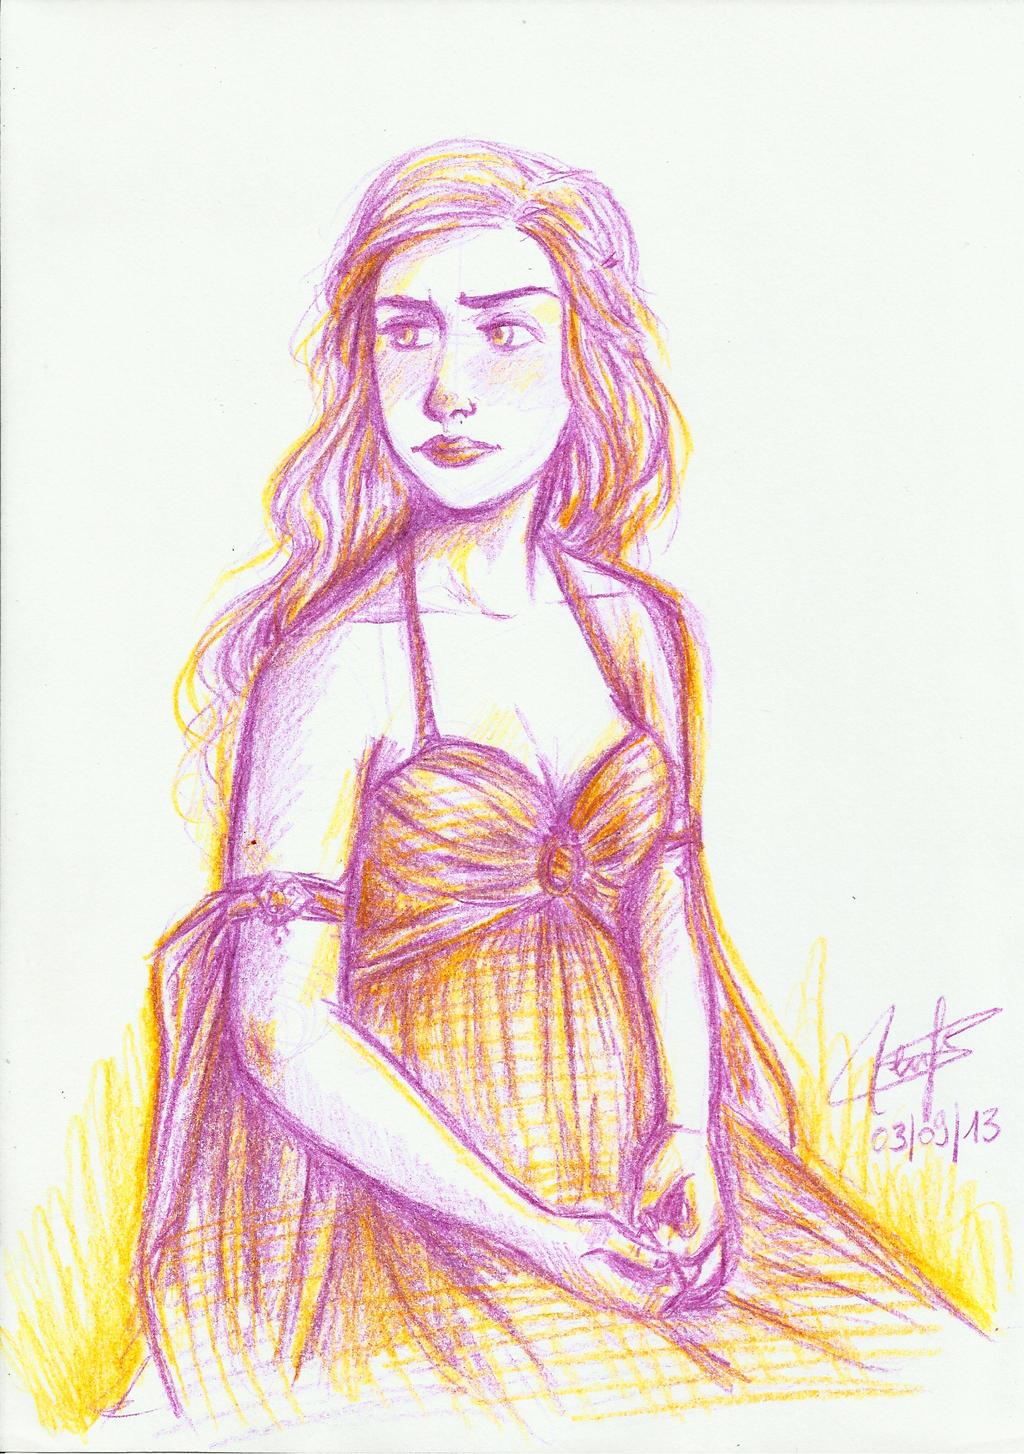 Daenerys by SerifeB